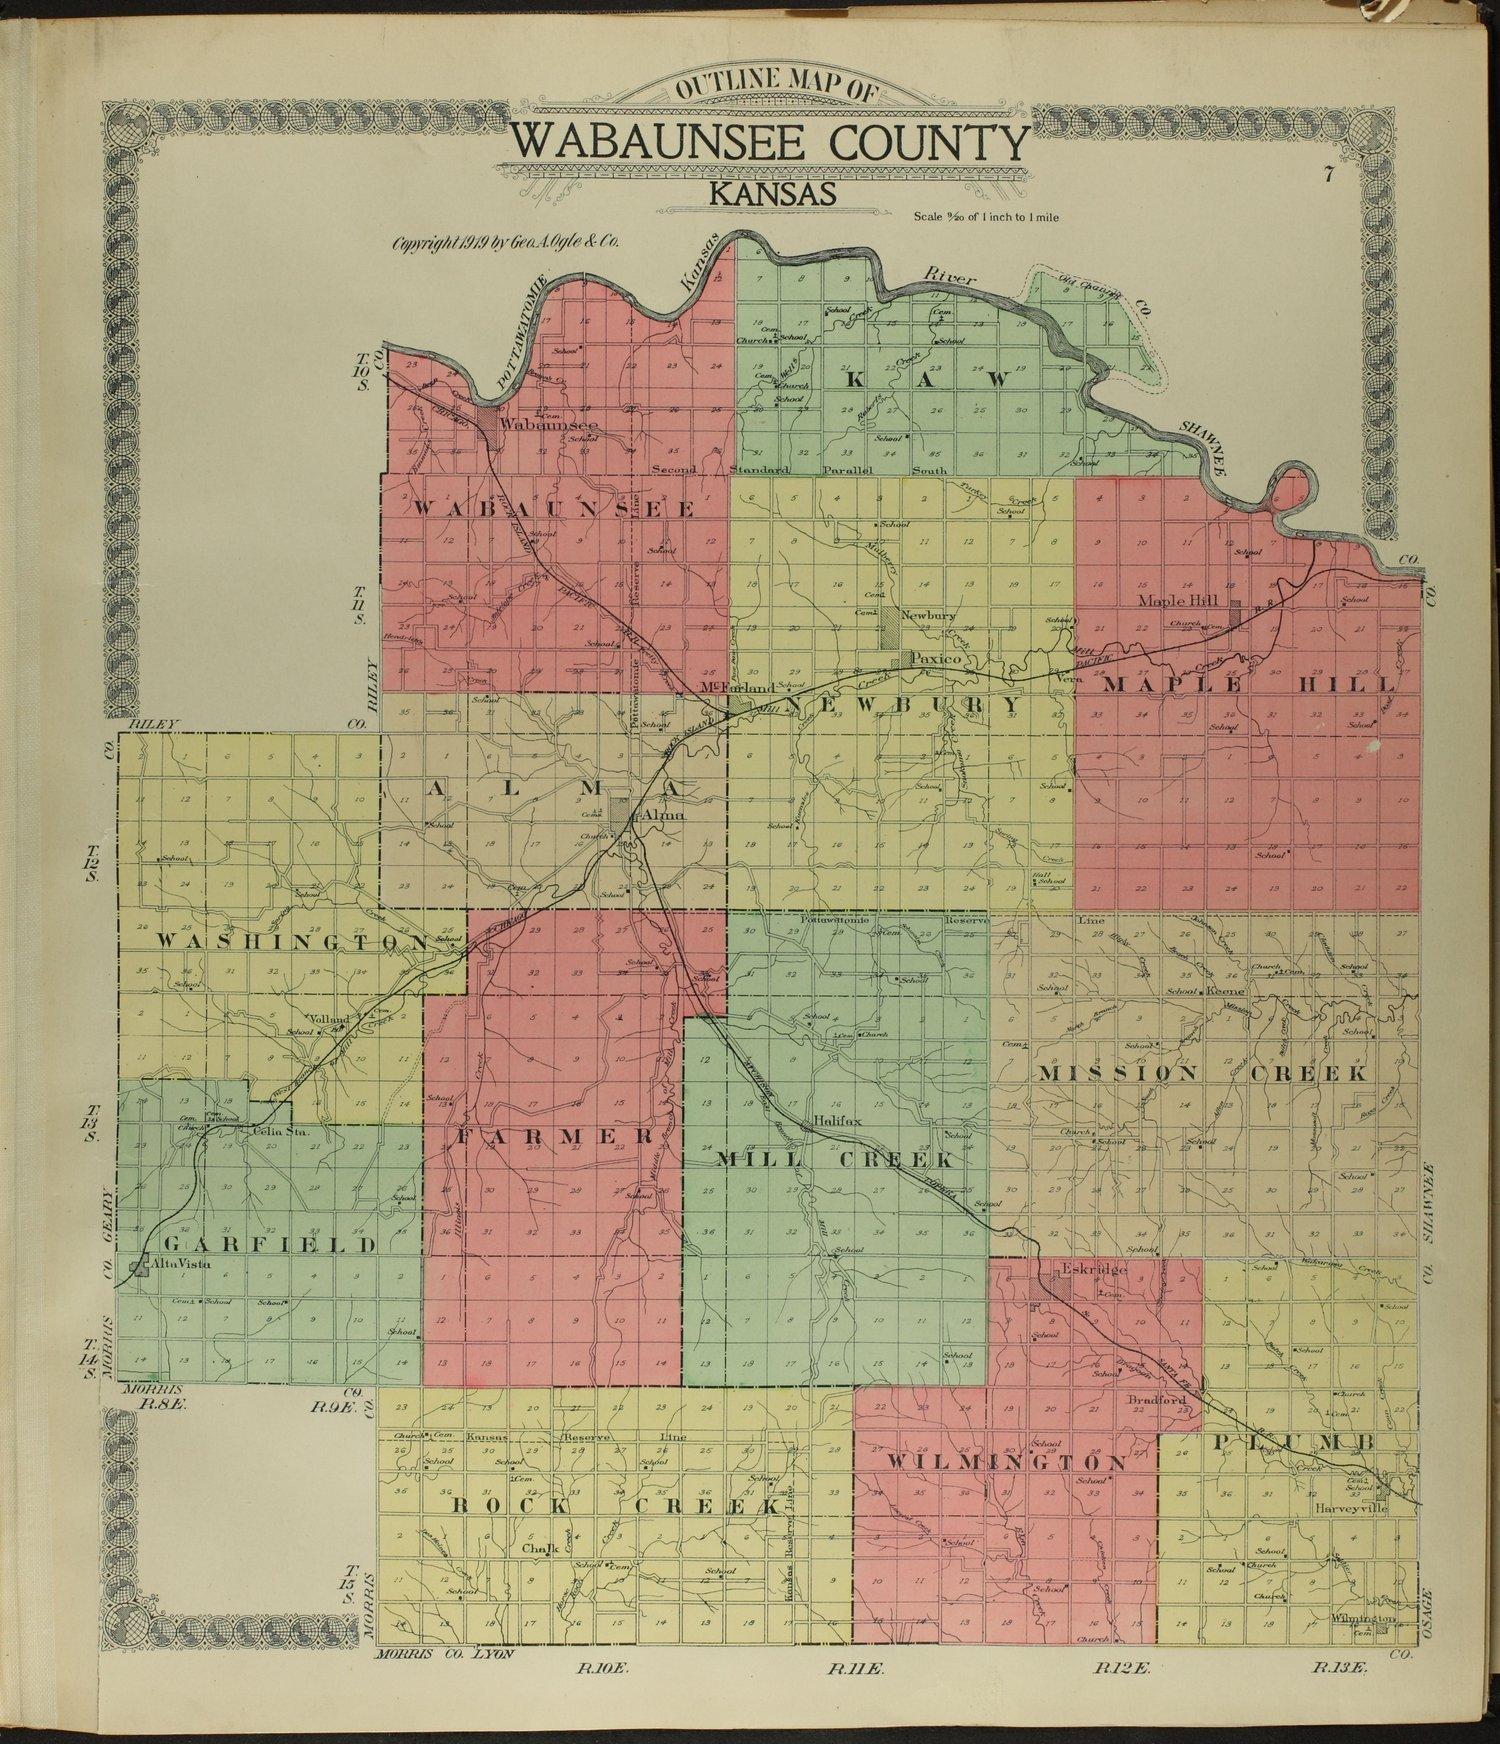 Standard atlas of Wabaunsee County, Kansas - 7